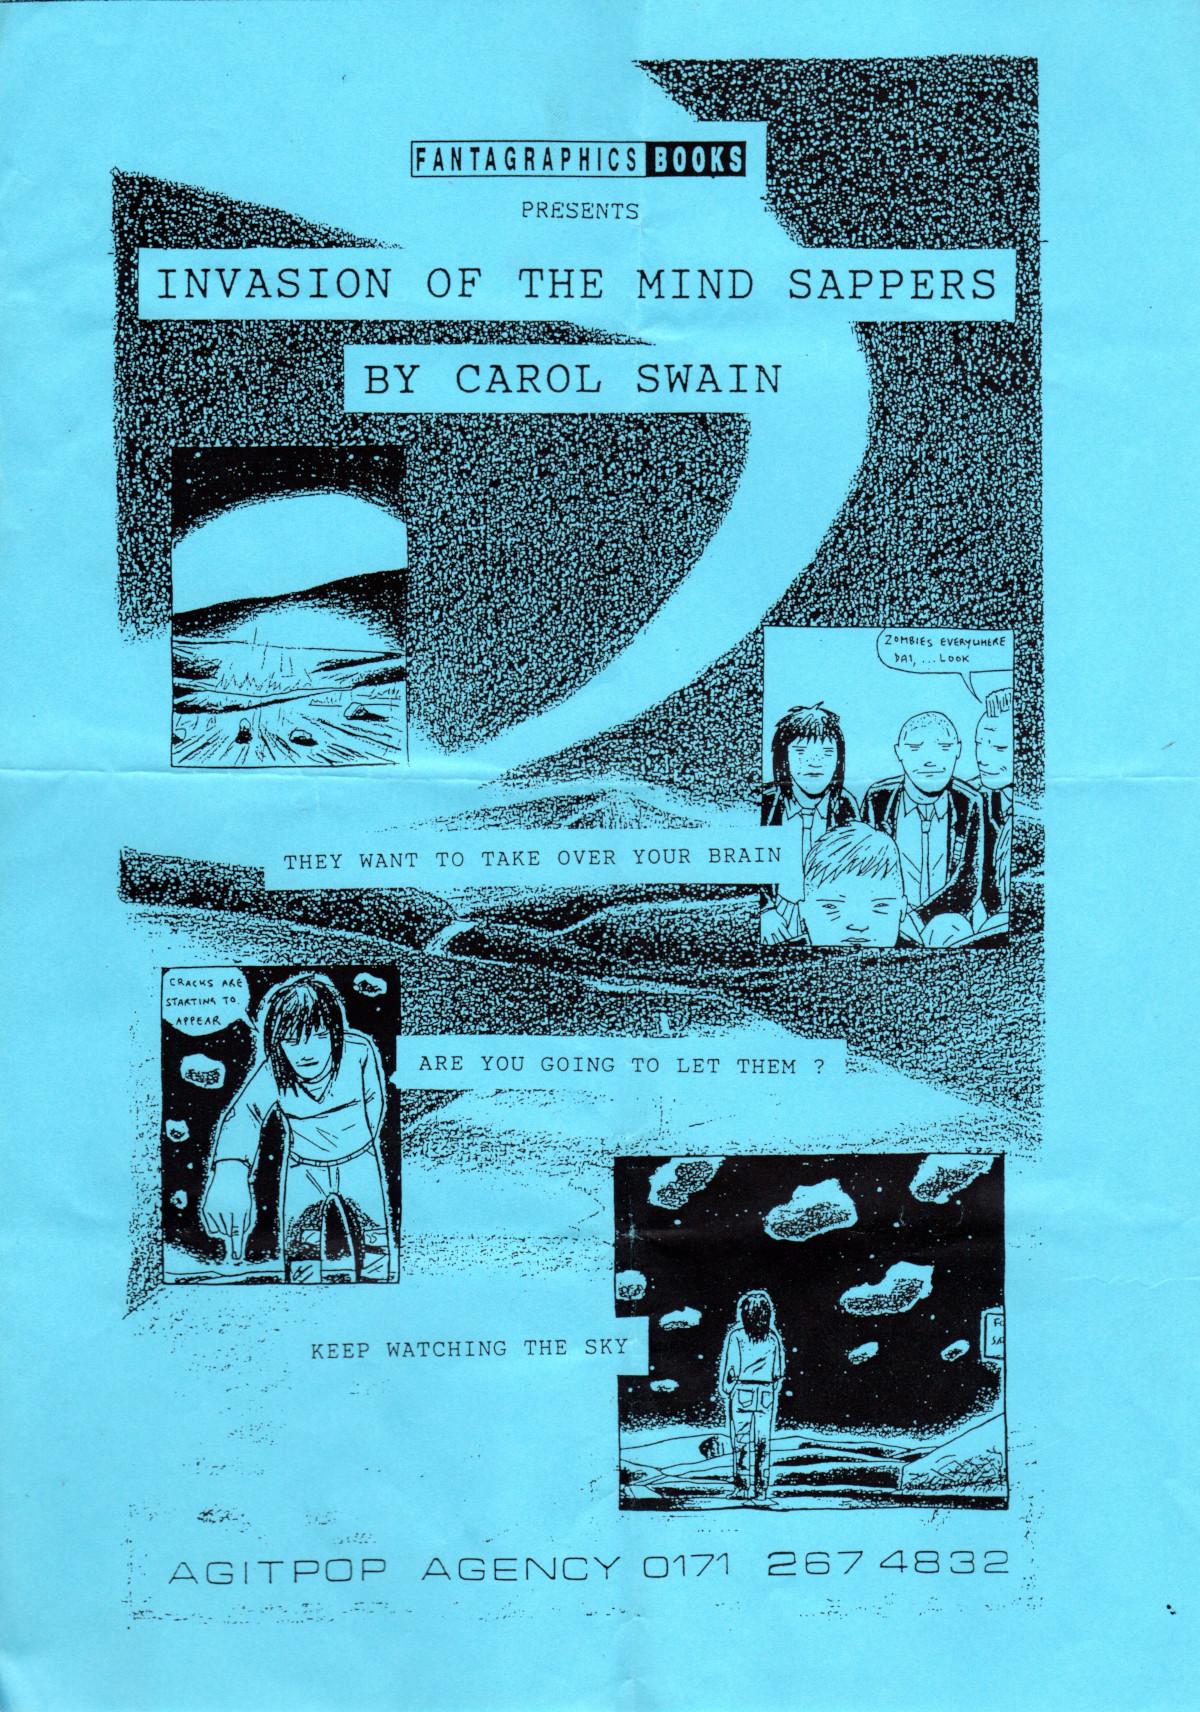 Flyer for Carol Swain book